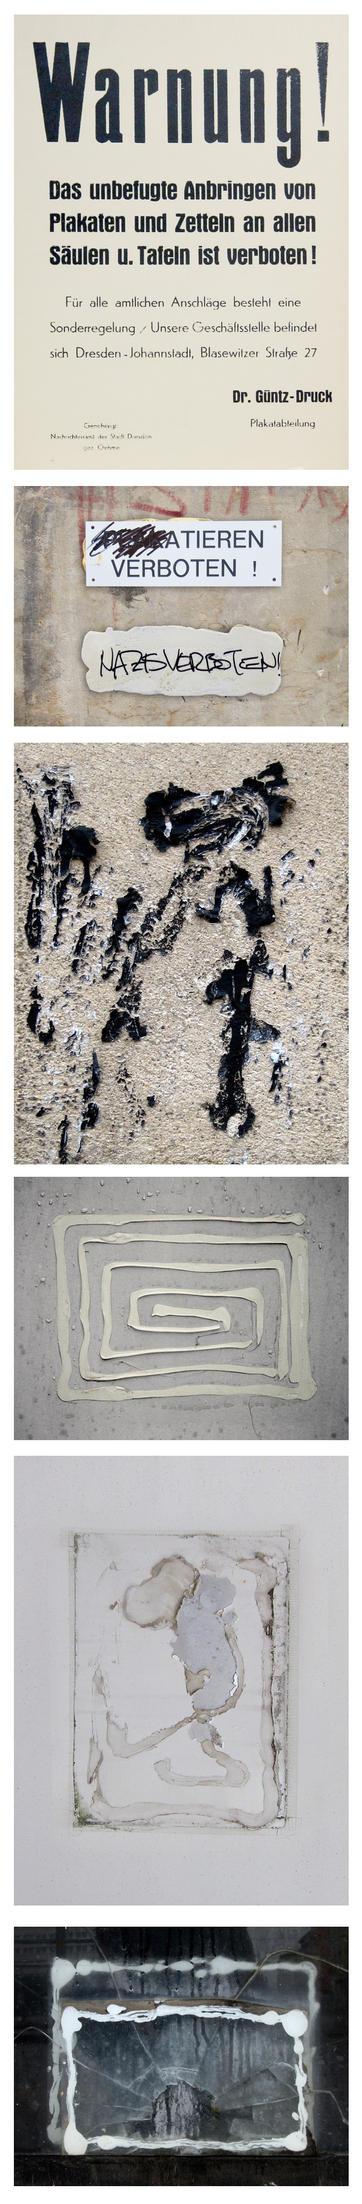 The way of glue by derkert